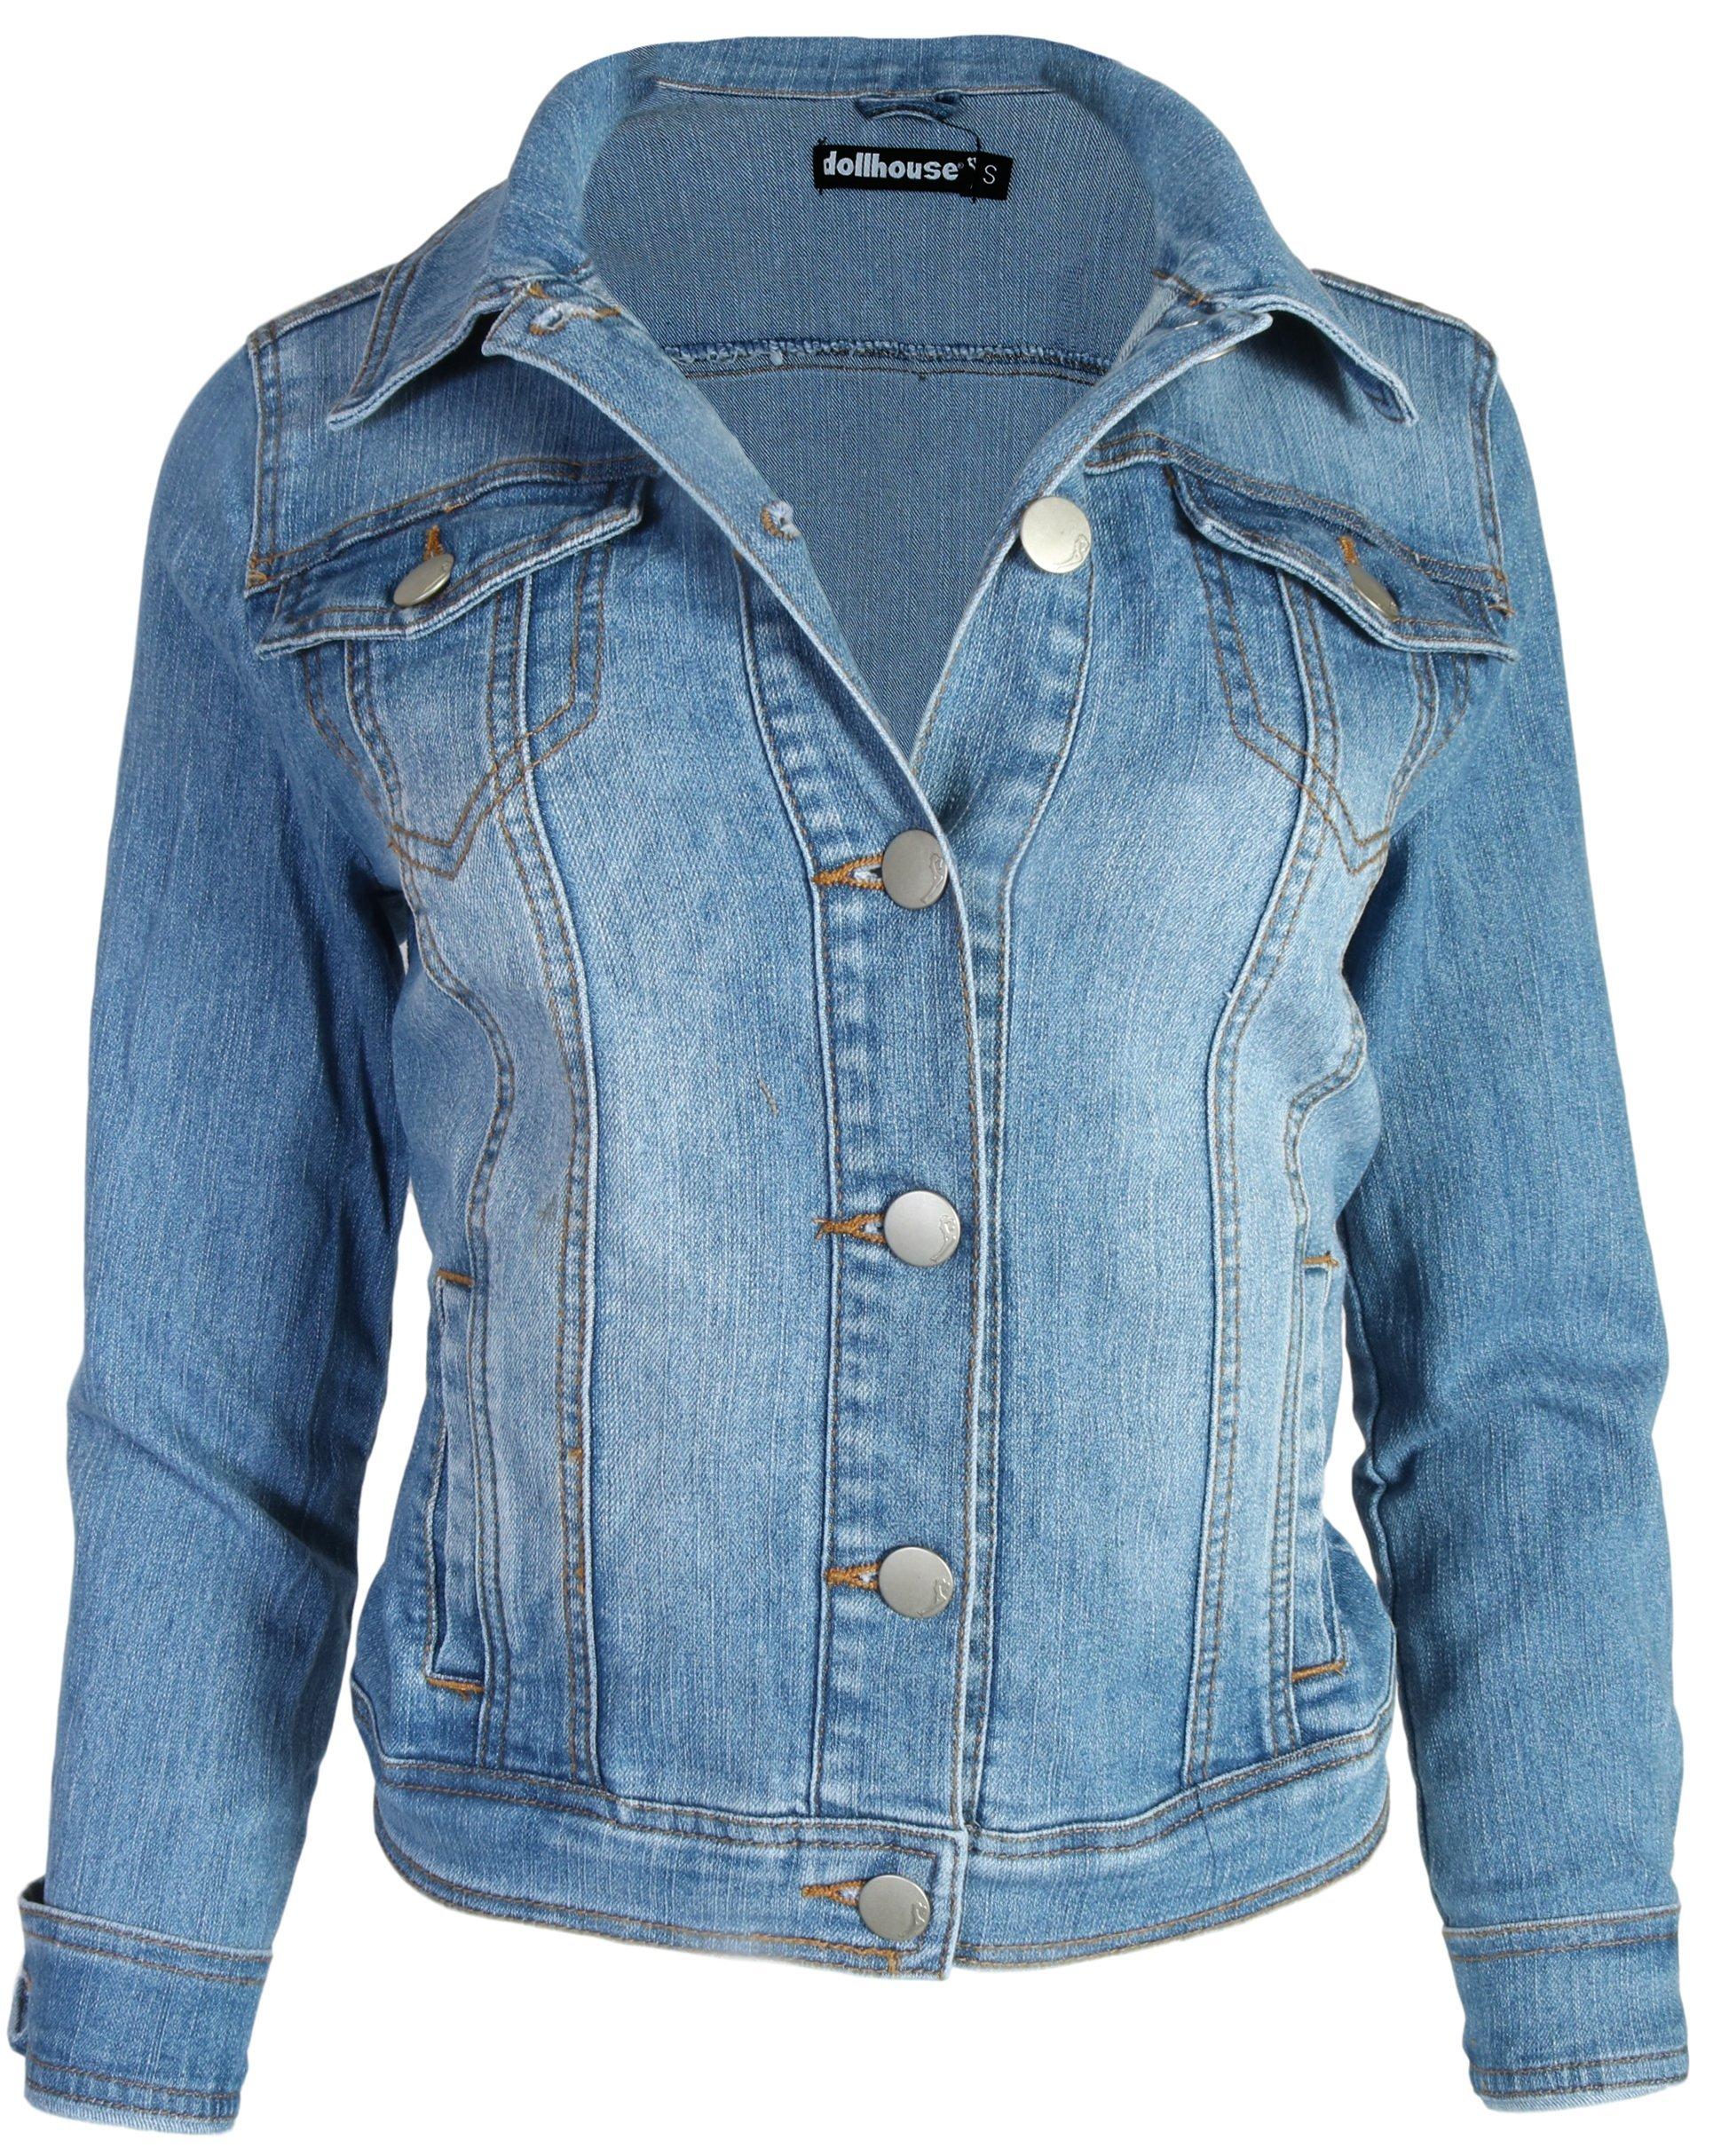 dollhouse Women Basic Denim Jean Jacket, Medium, X-Large'